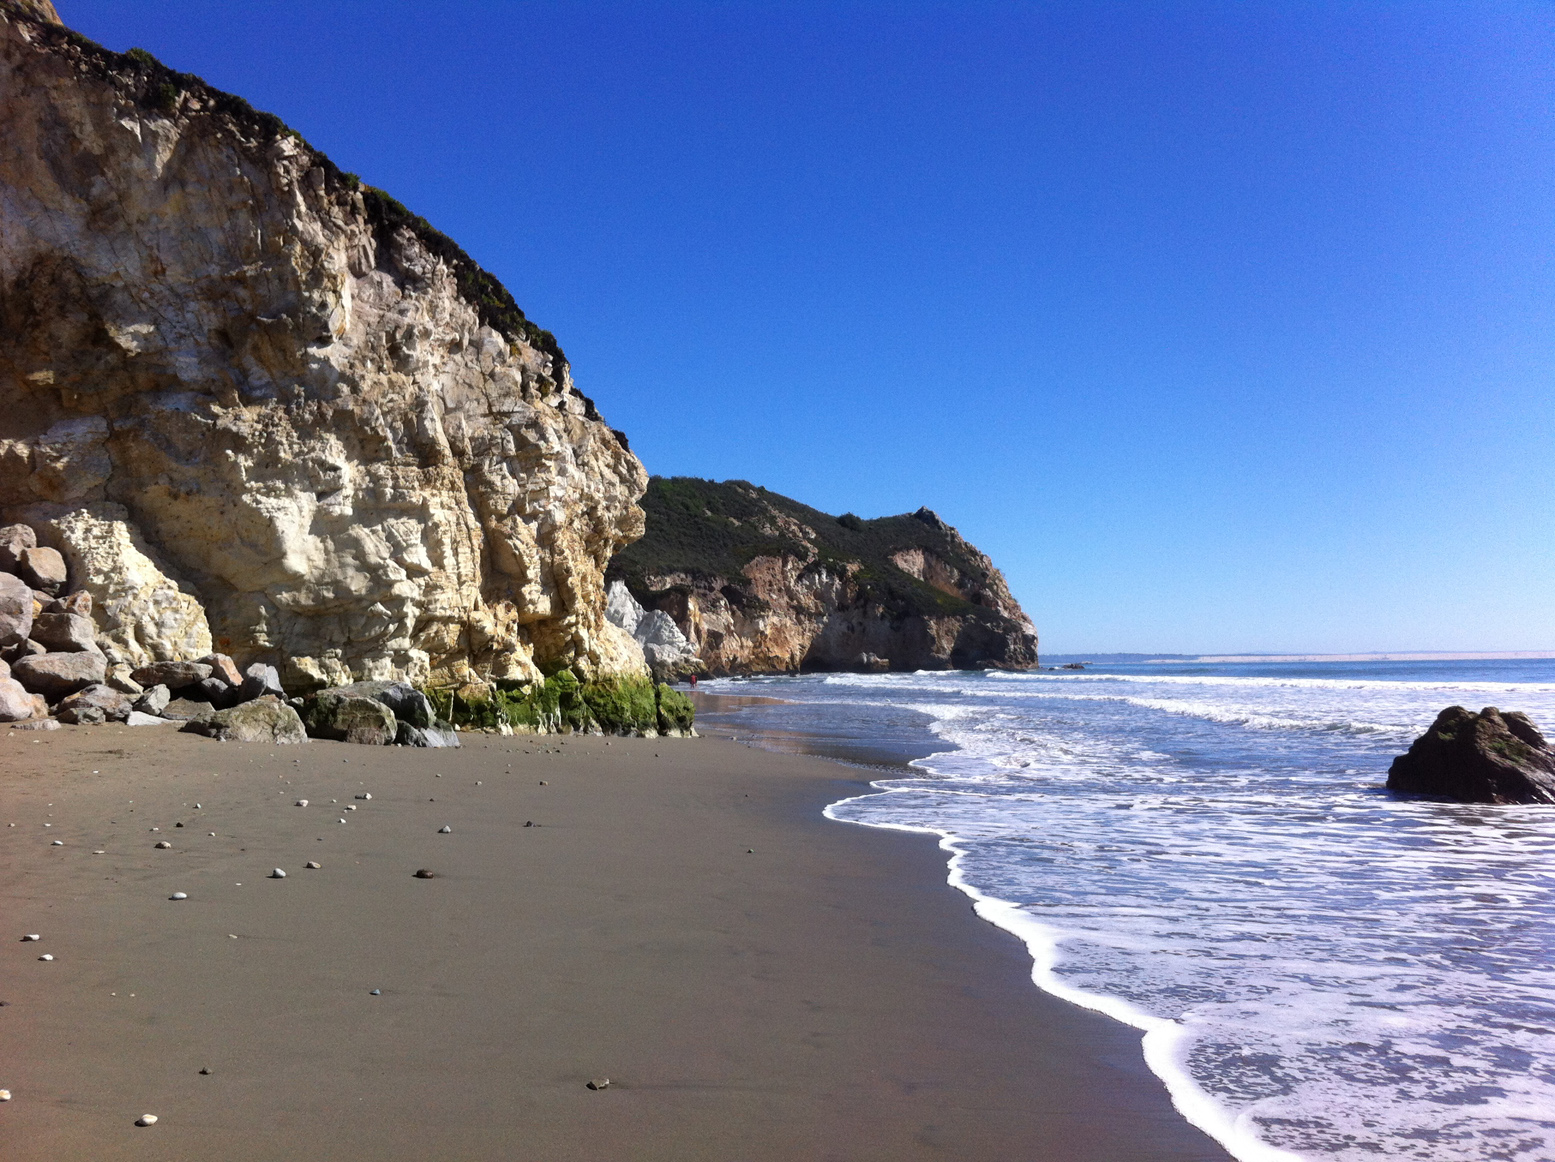 Avila Beach, California, Travel, Beaches, Hotels, Food and Drink